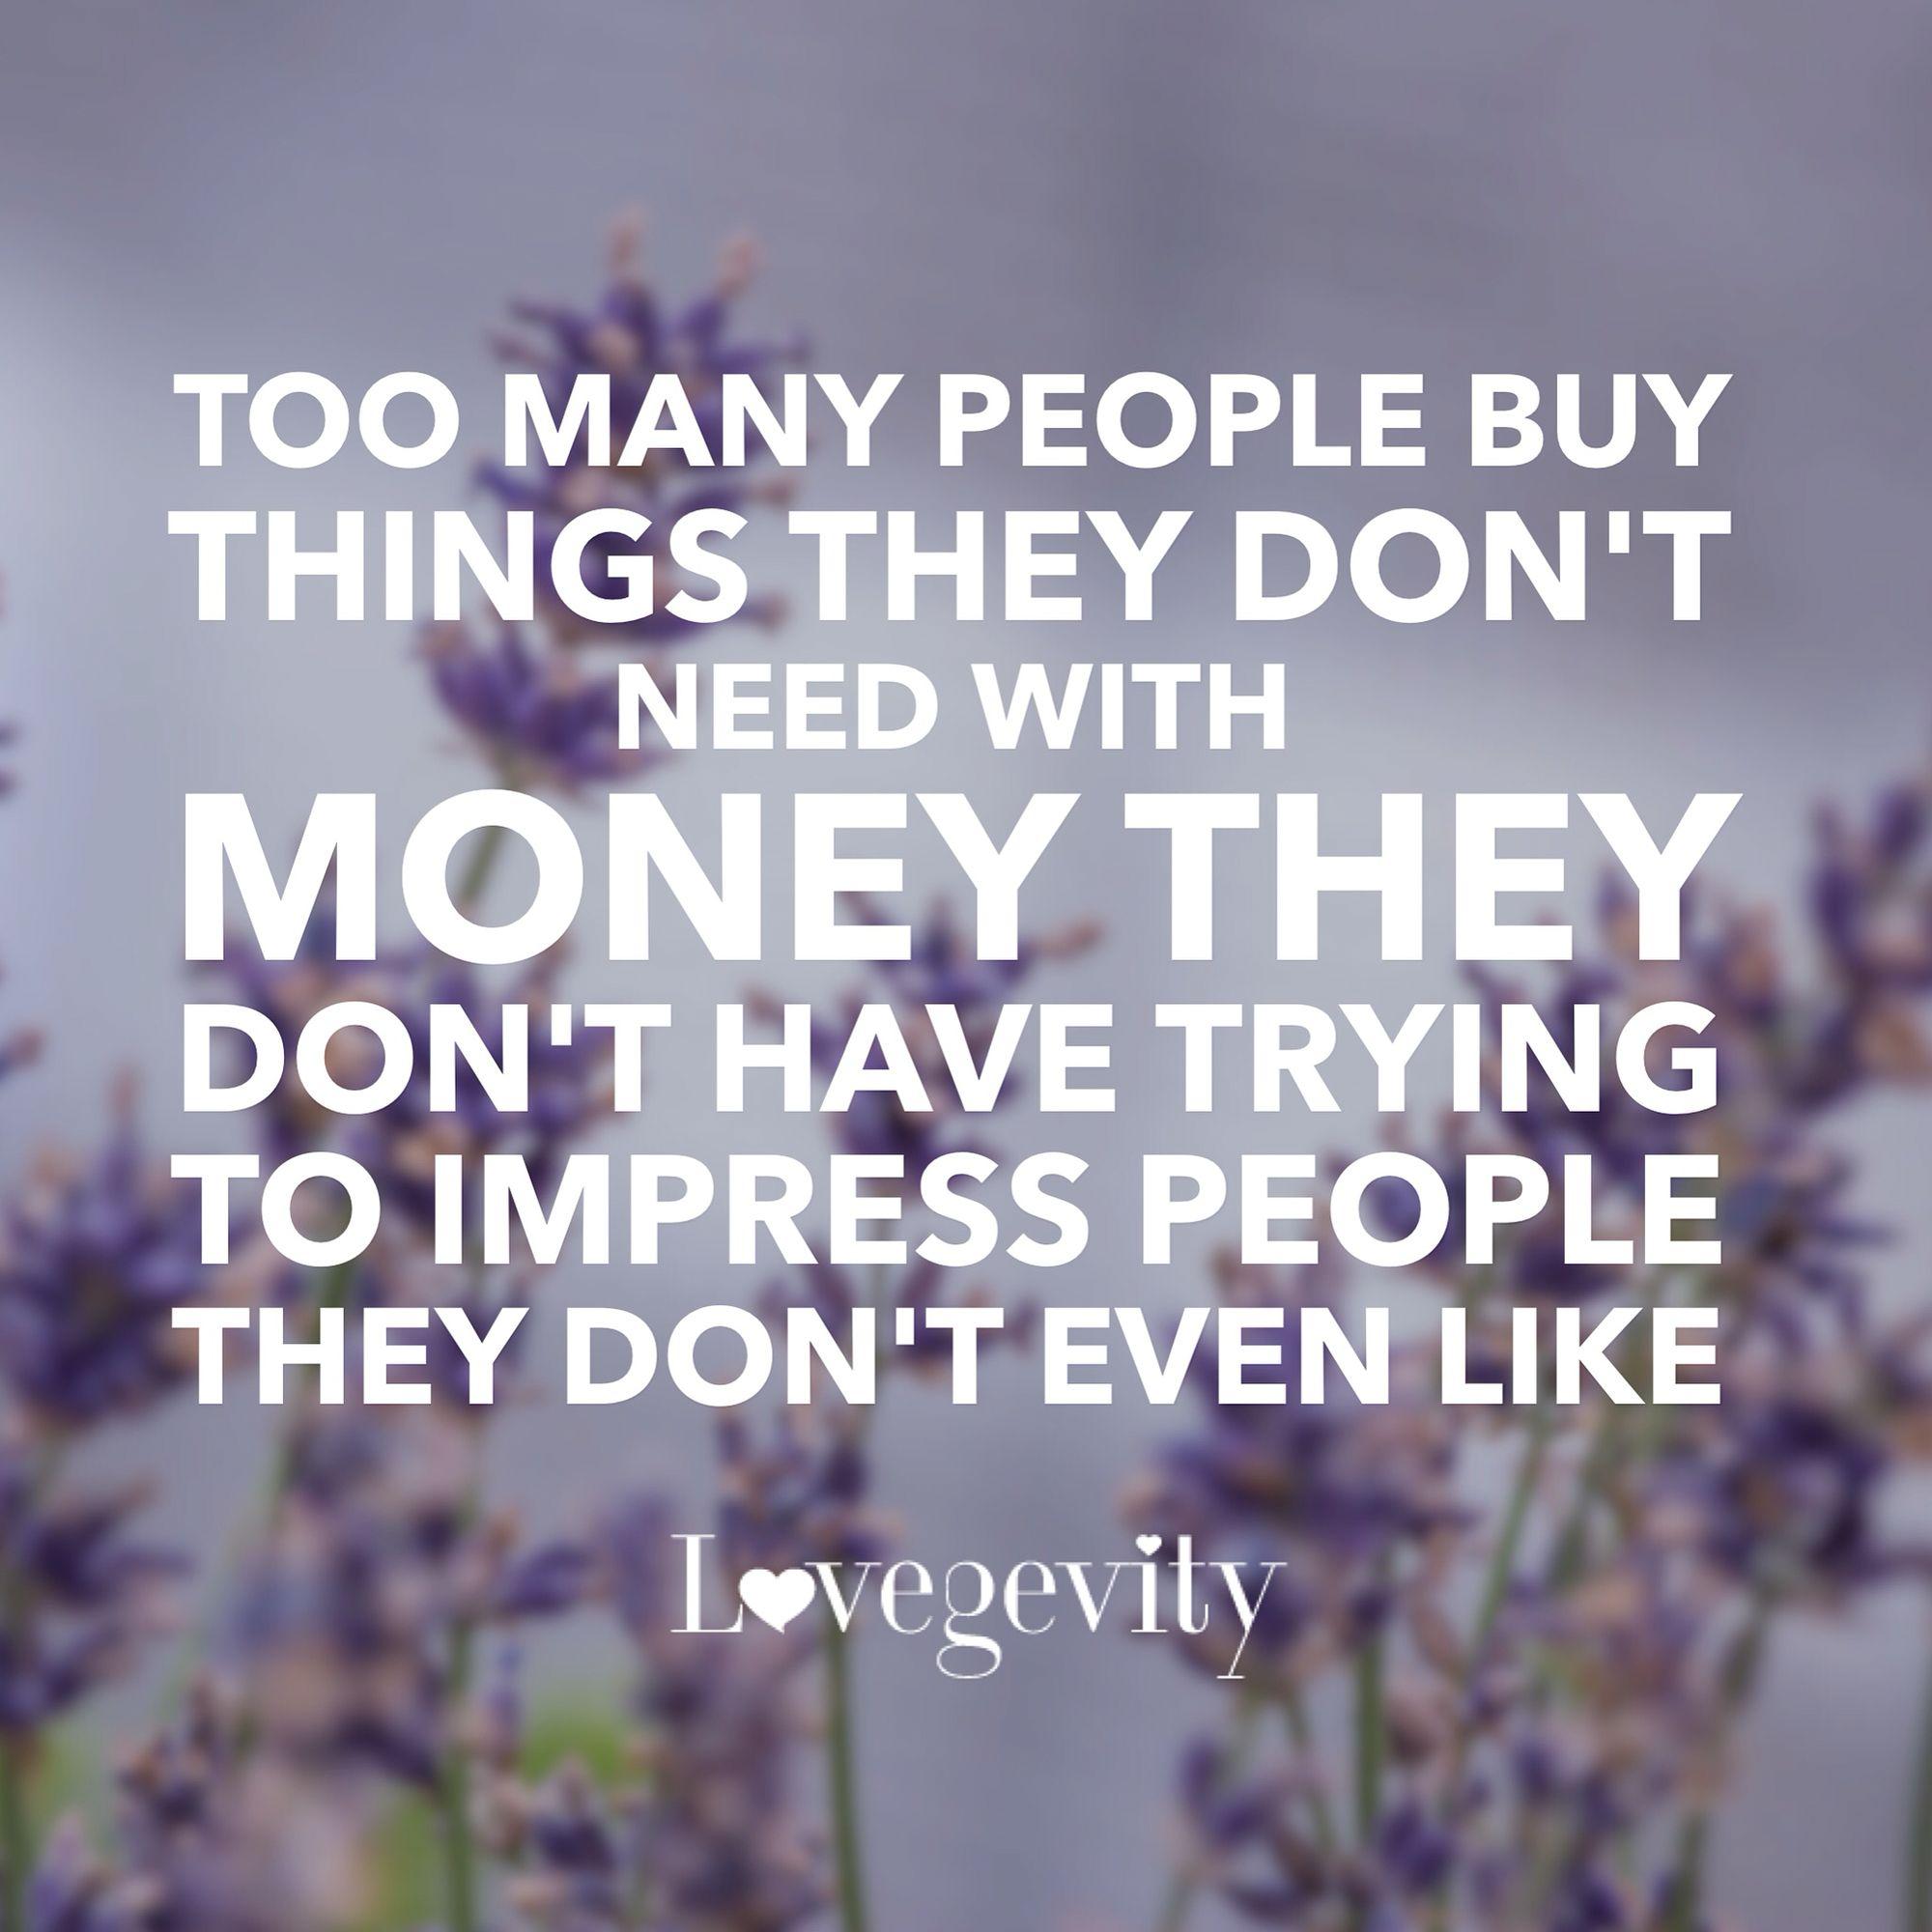 #ShareTheLovegevity #Lovegevity #Love #LWPI #Quotes